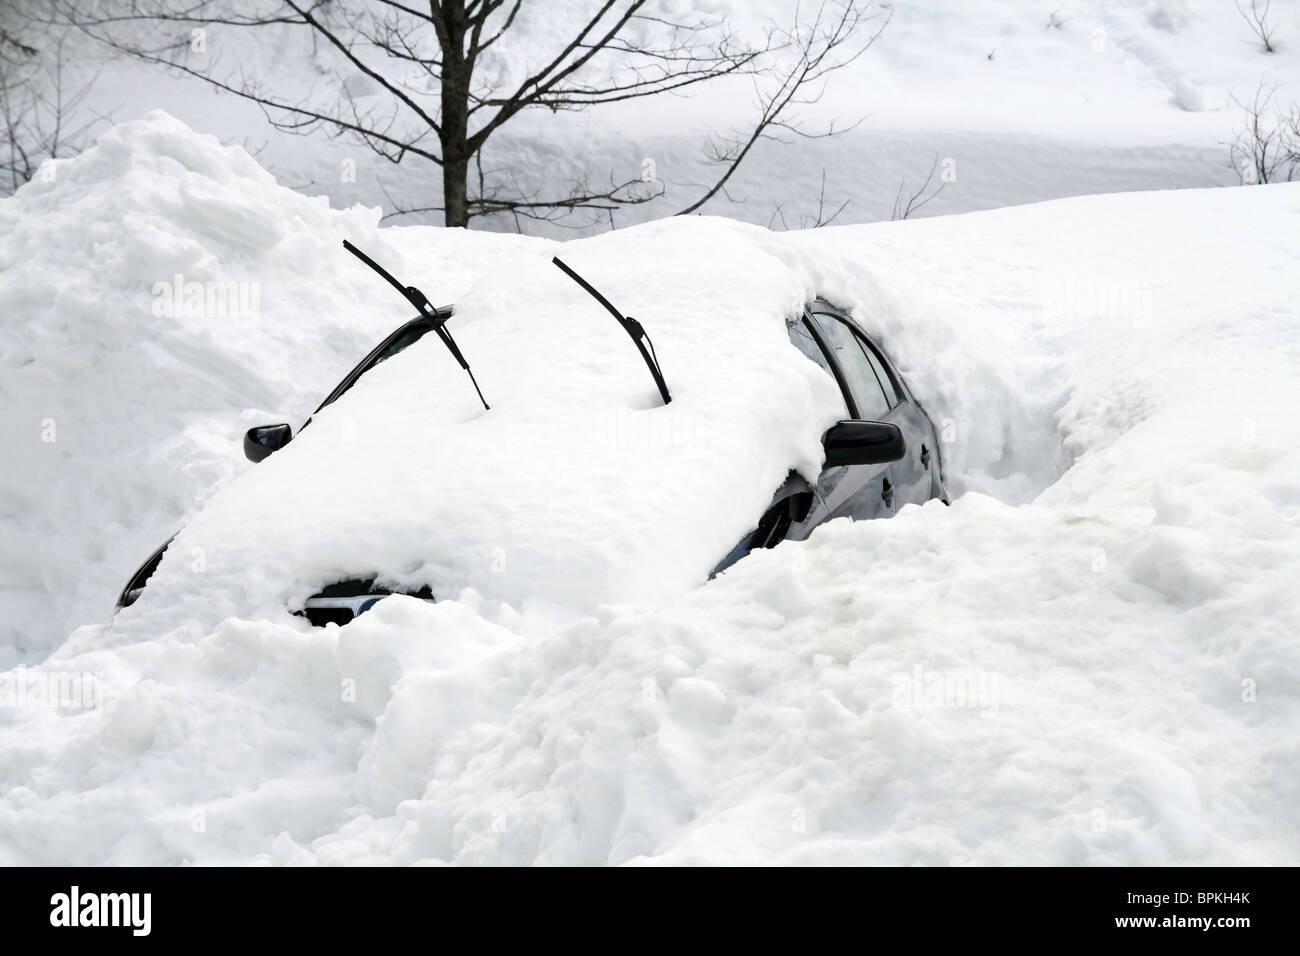 Car under snowdrift - Stock Image